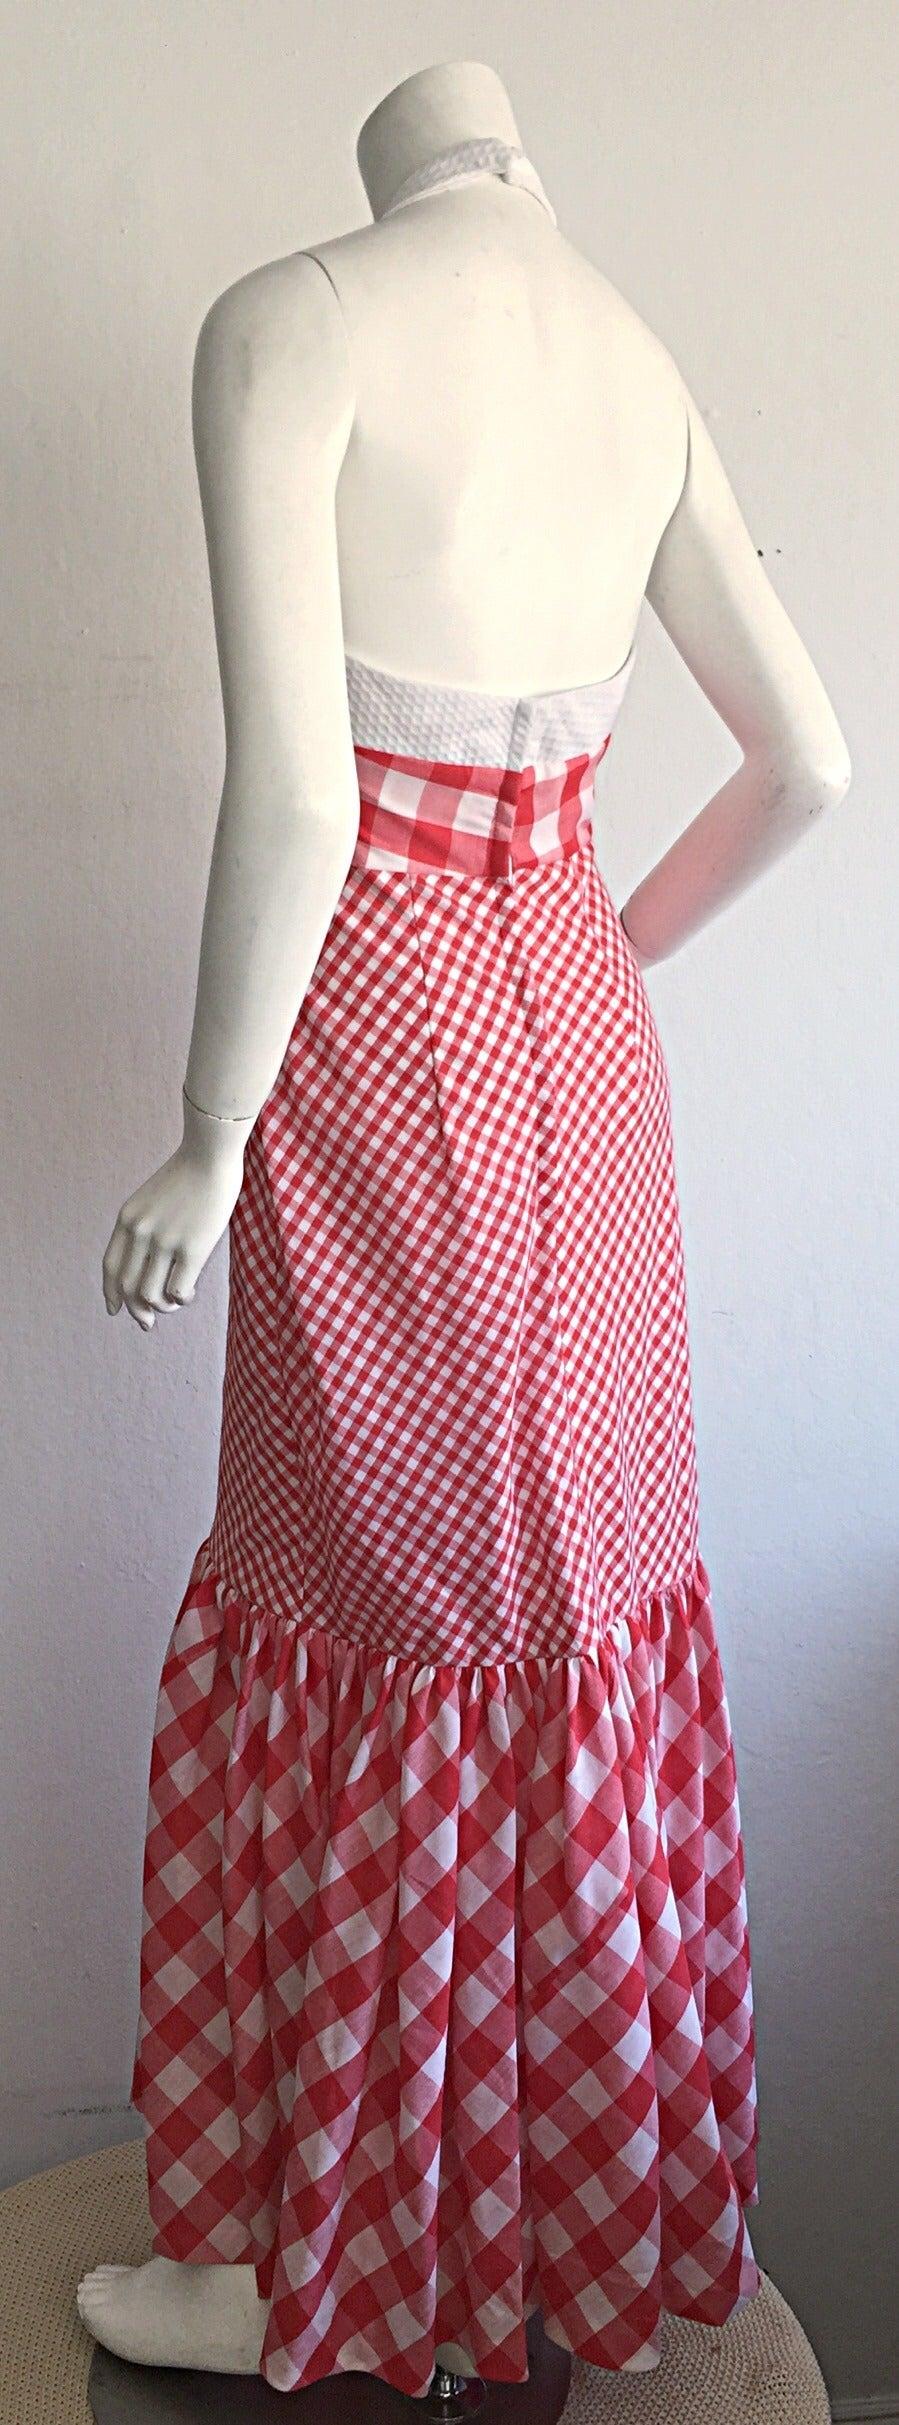 Vintage 1970s Red + White ' Picnic Table ' Plaid Cotton Halter Maxi Dress 7